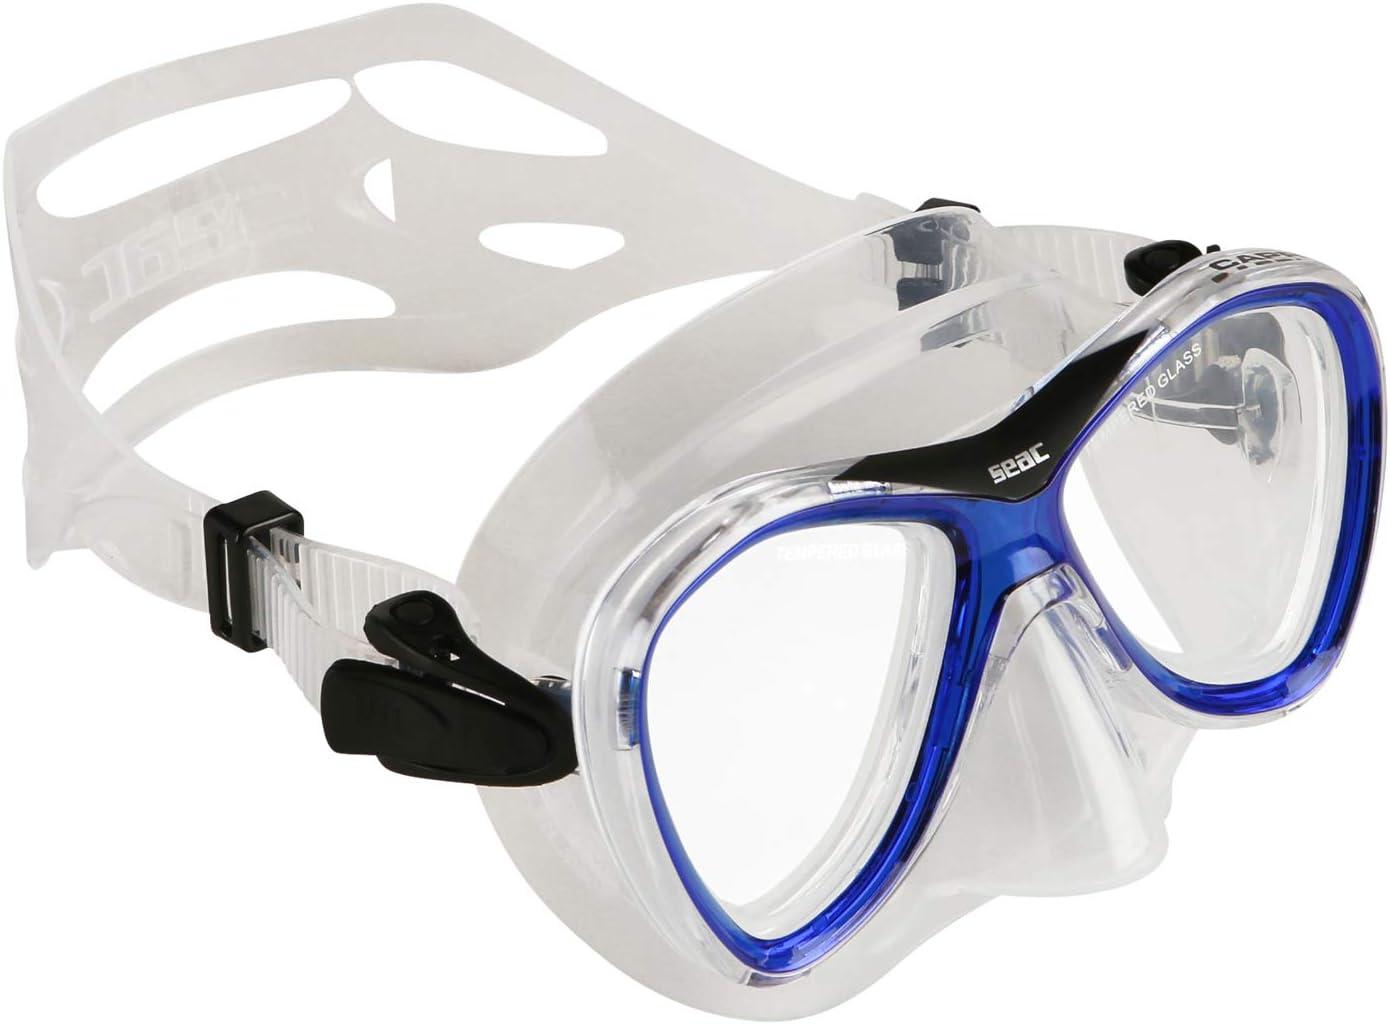 Seac 2021 model Snorkeling Capri Mask It is very popular Siltra